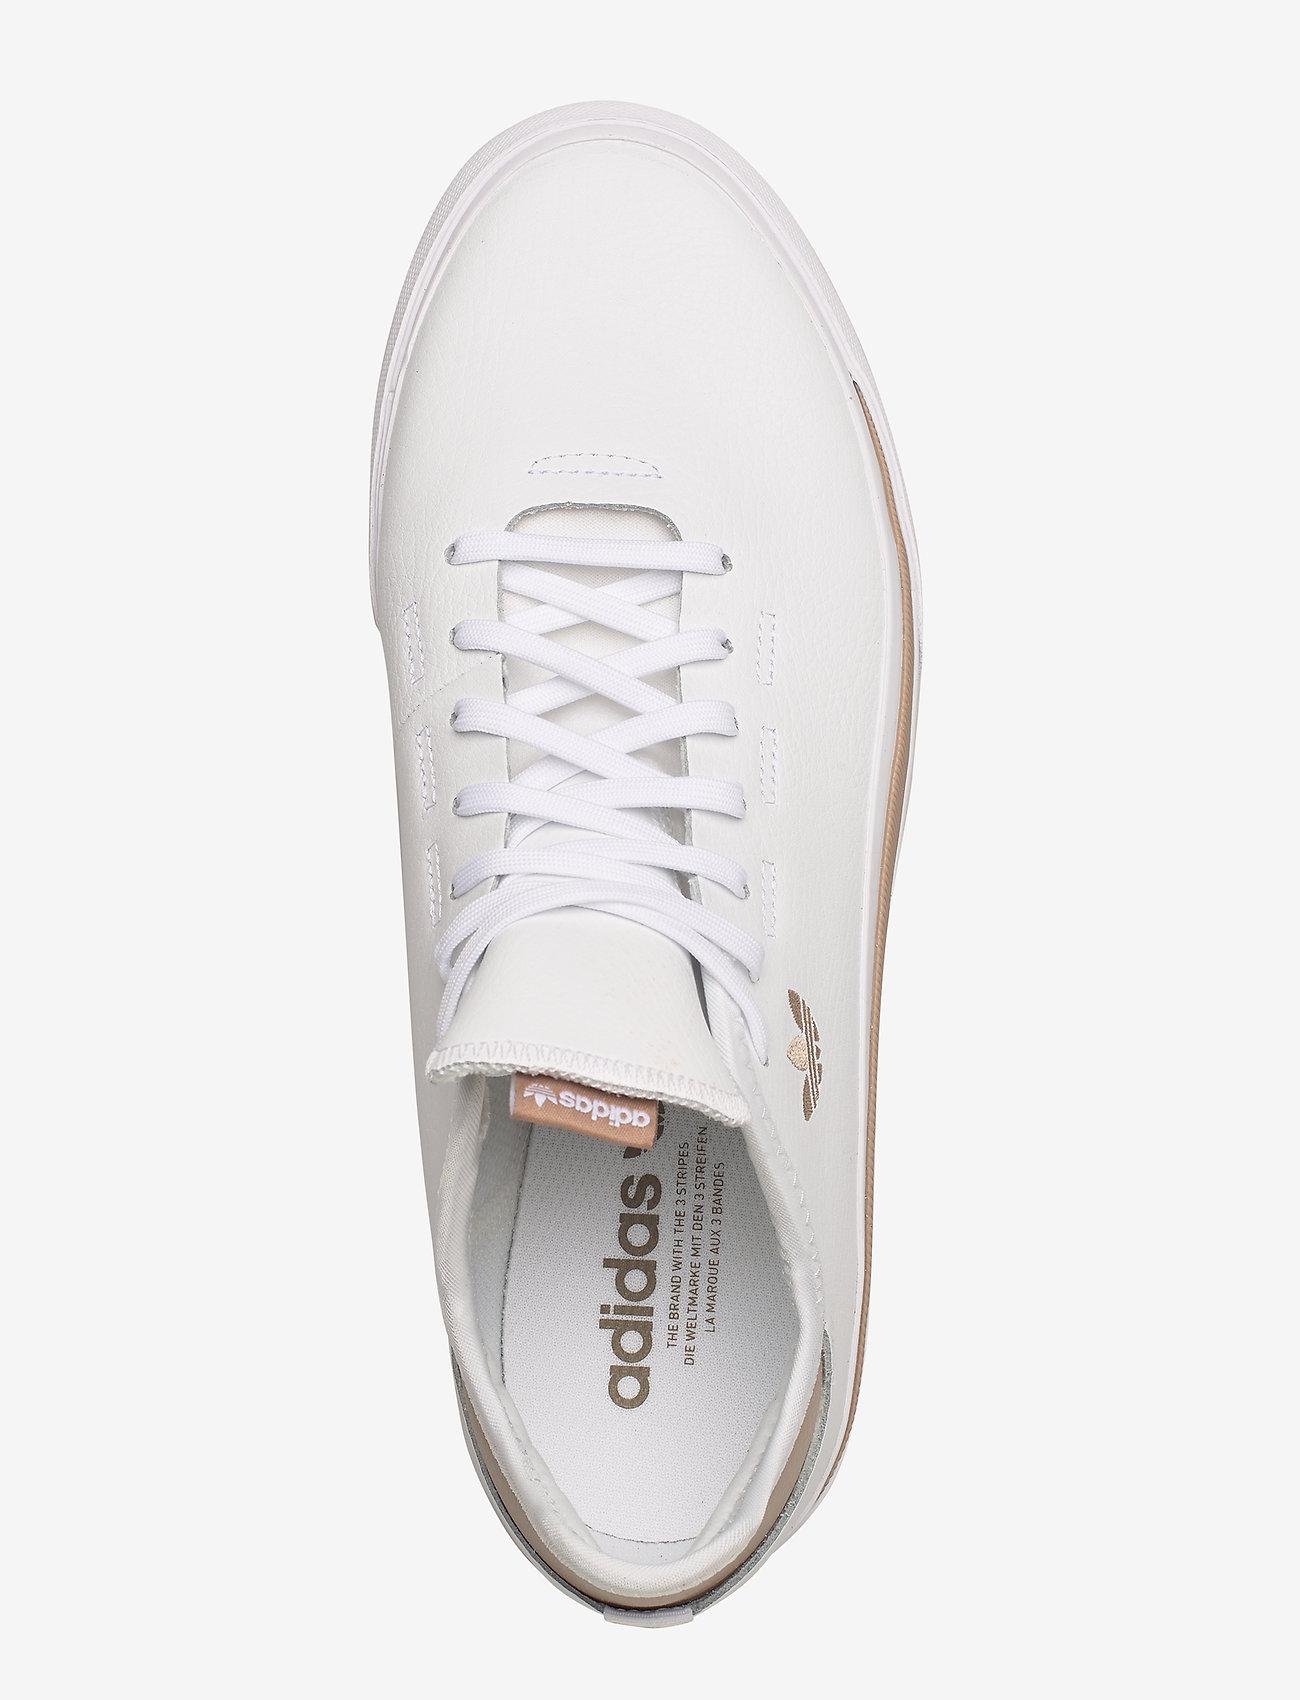 Sabalo (Ftwwht/ftwwht/ftwwht) (69.95 €) - adidas Originals GzVlm